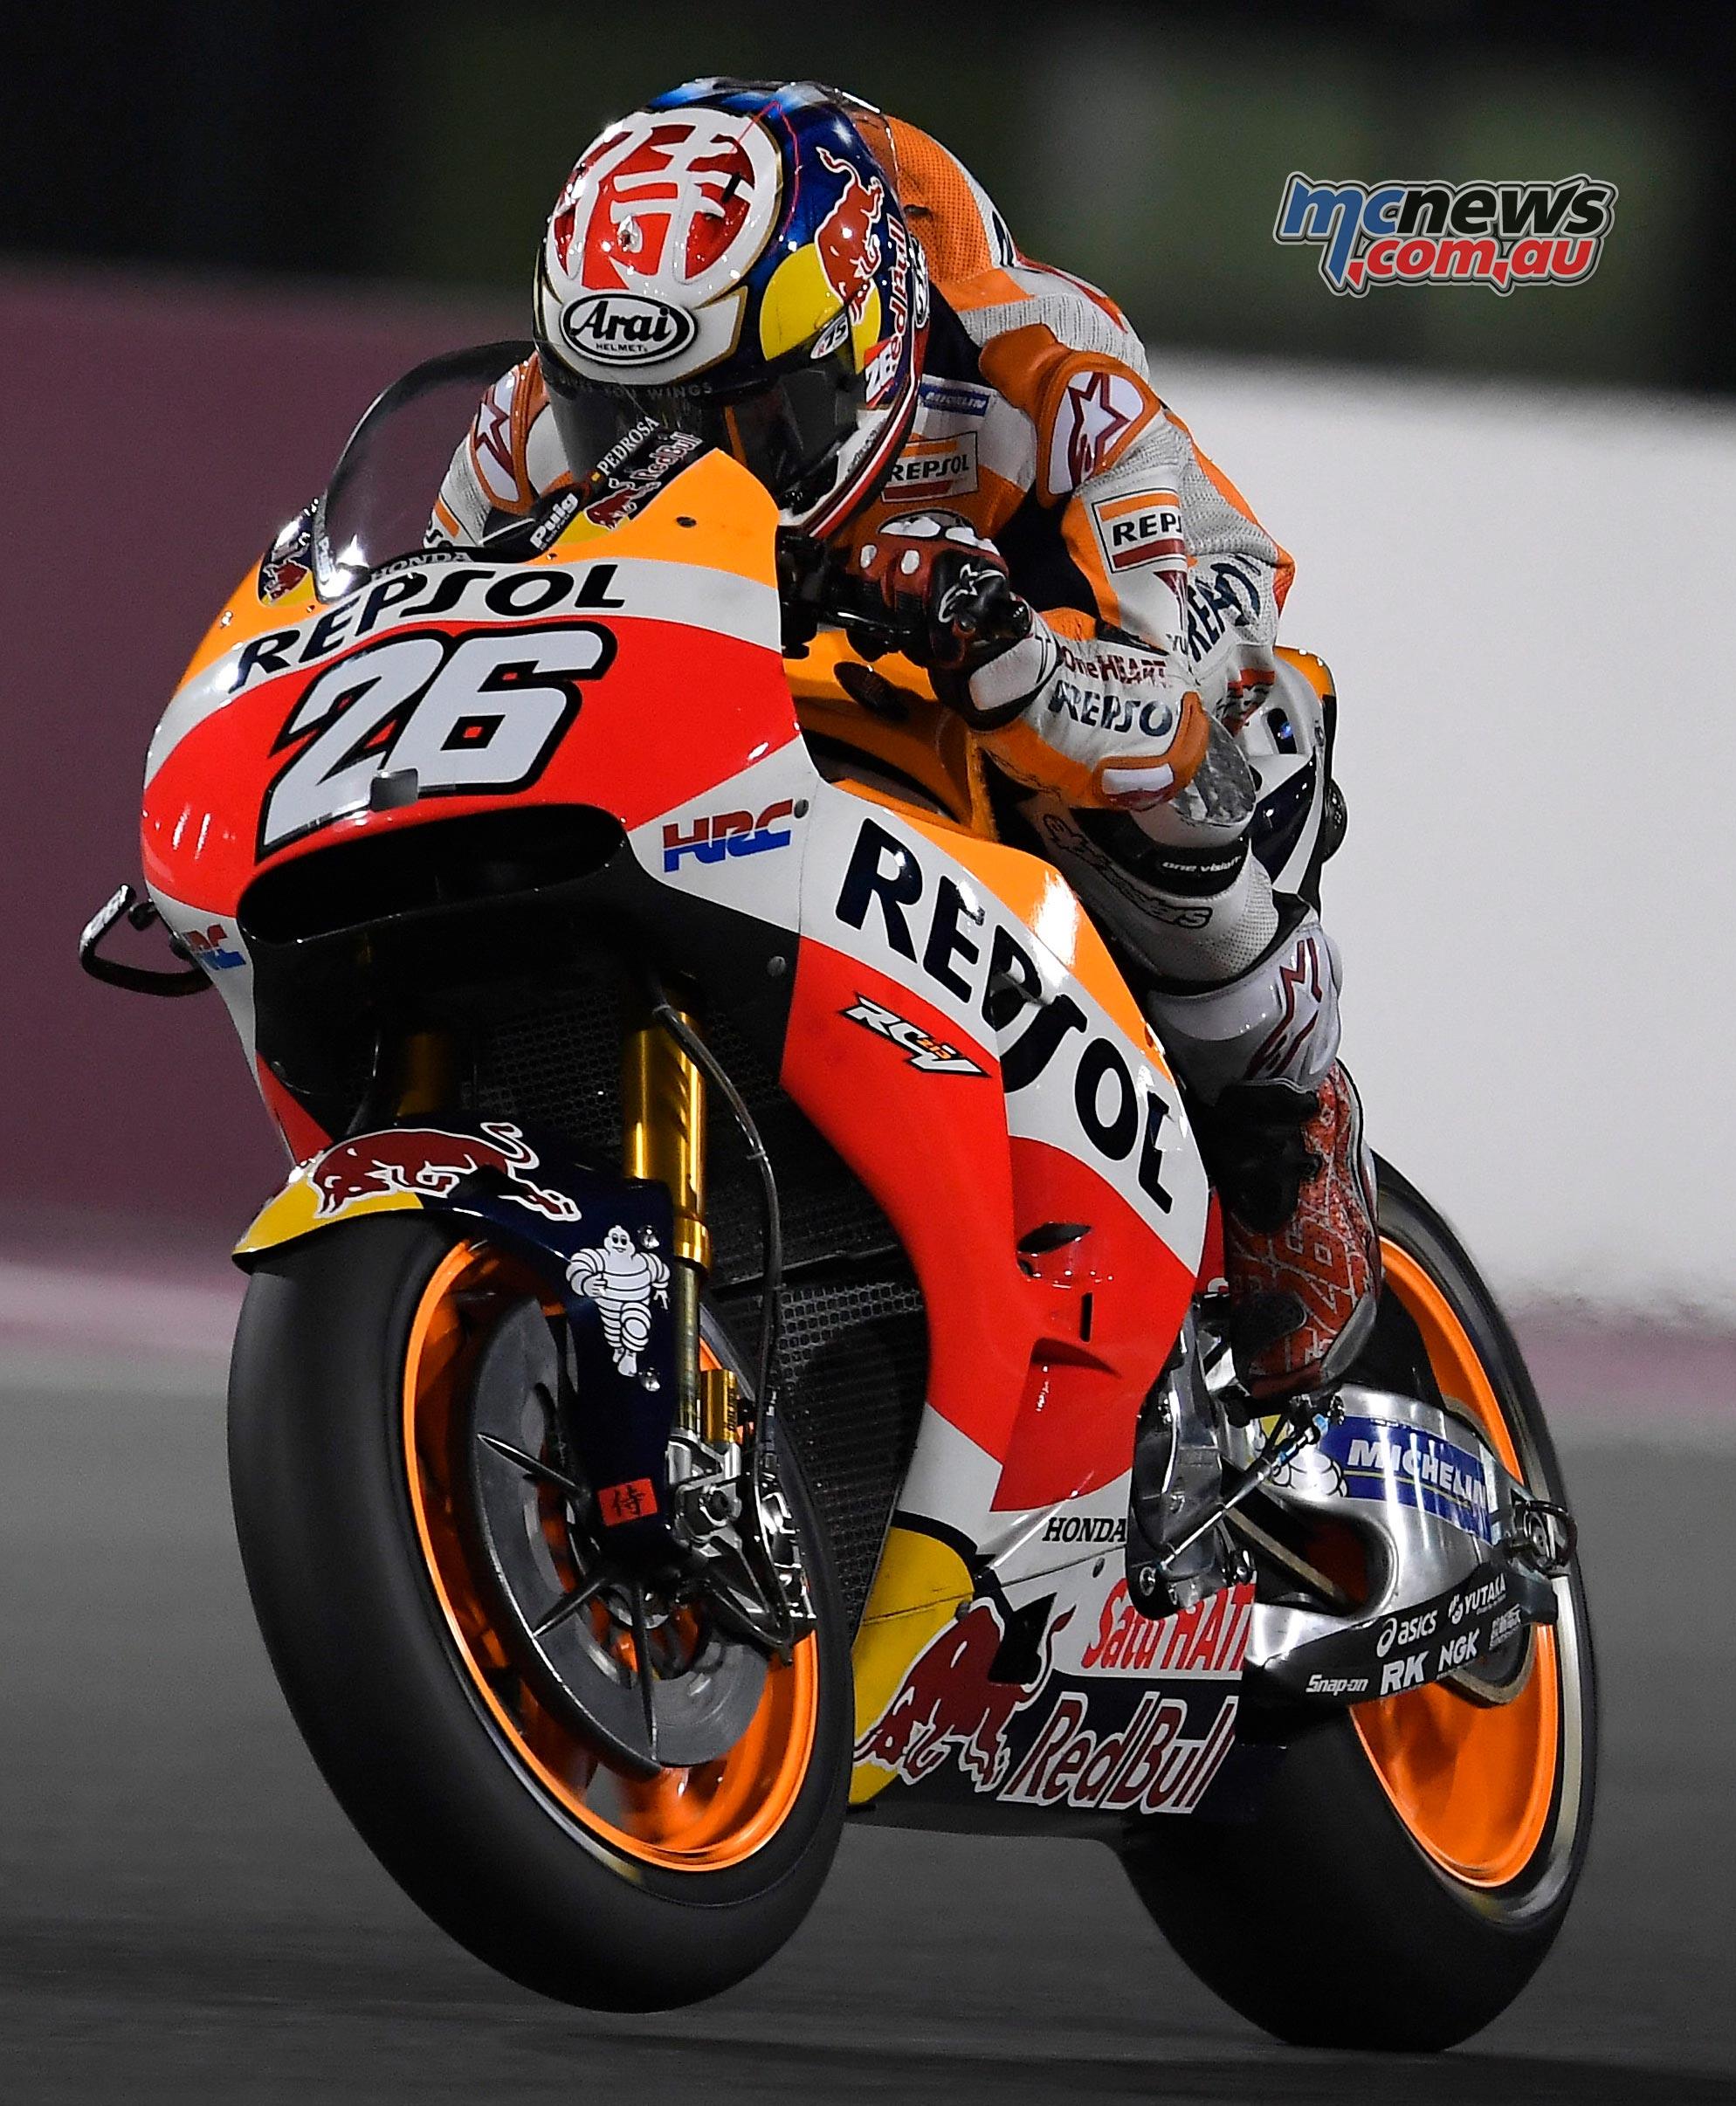 Qatar MotoGP Sunday Race Day Guide | MCNews.com.au